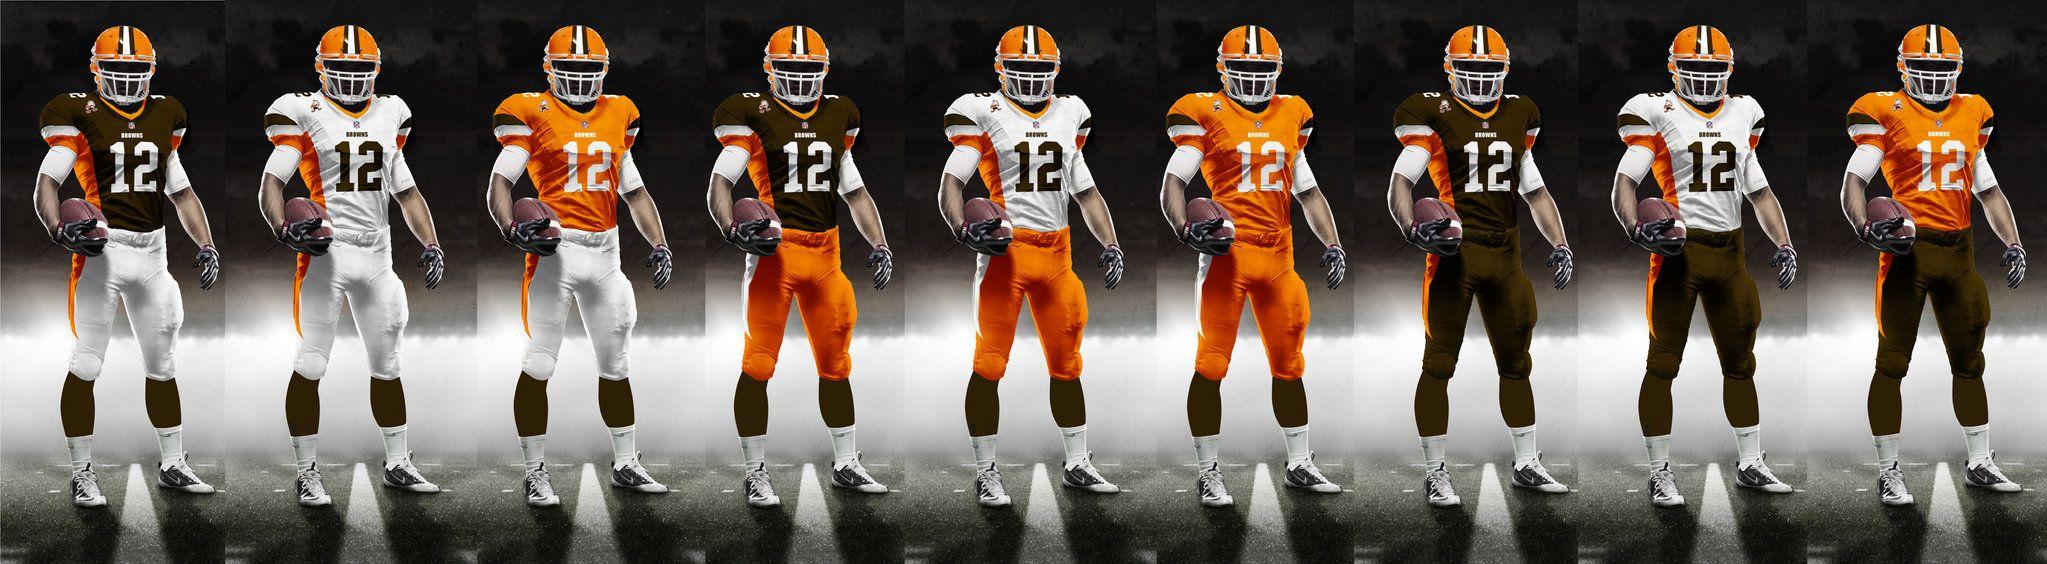 cleveland browns new jerseys